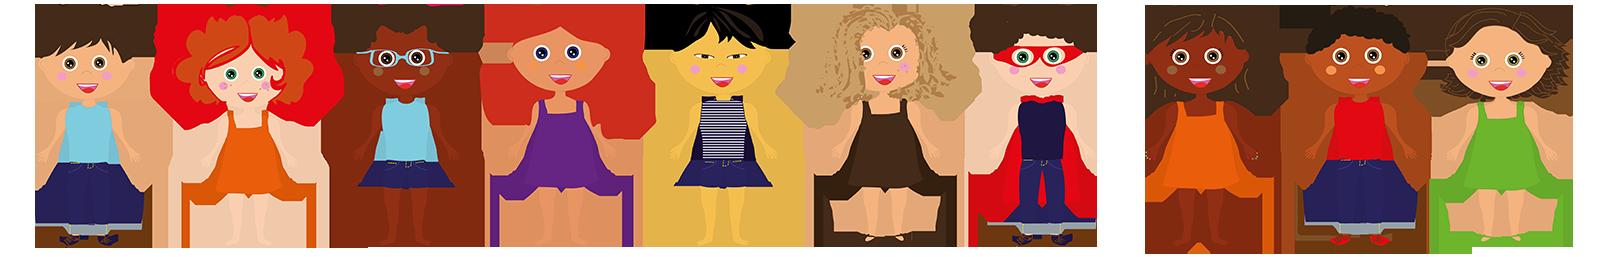 avatares personalizados - ludobooks